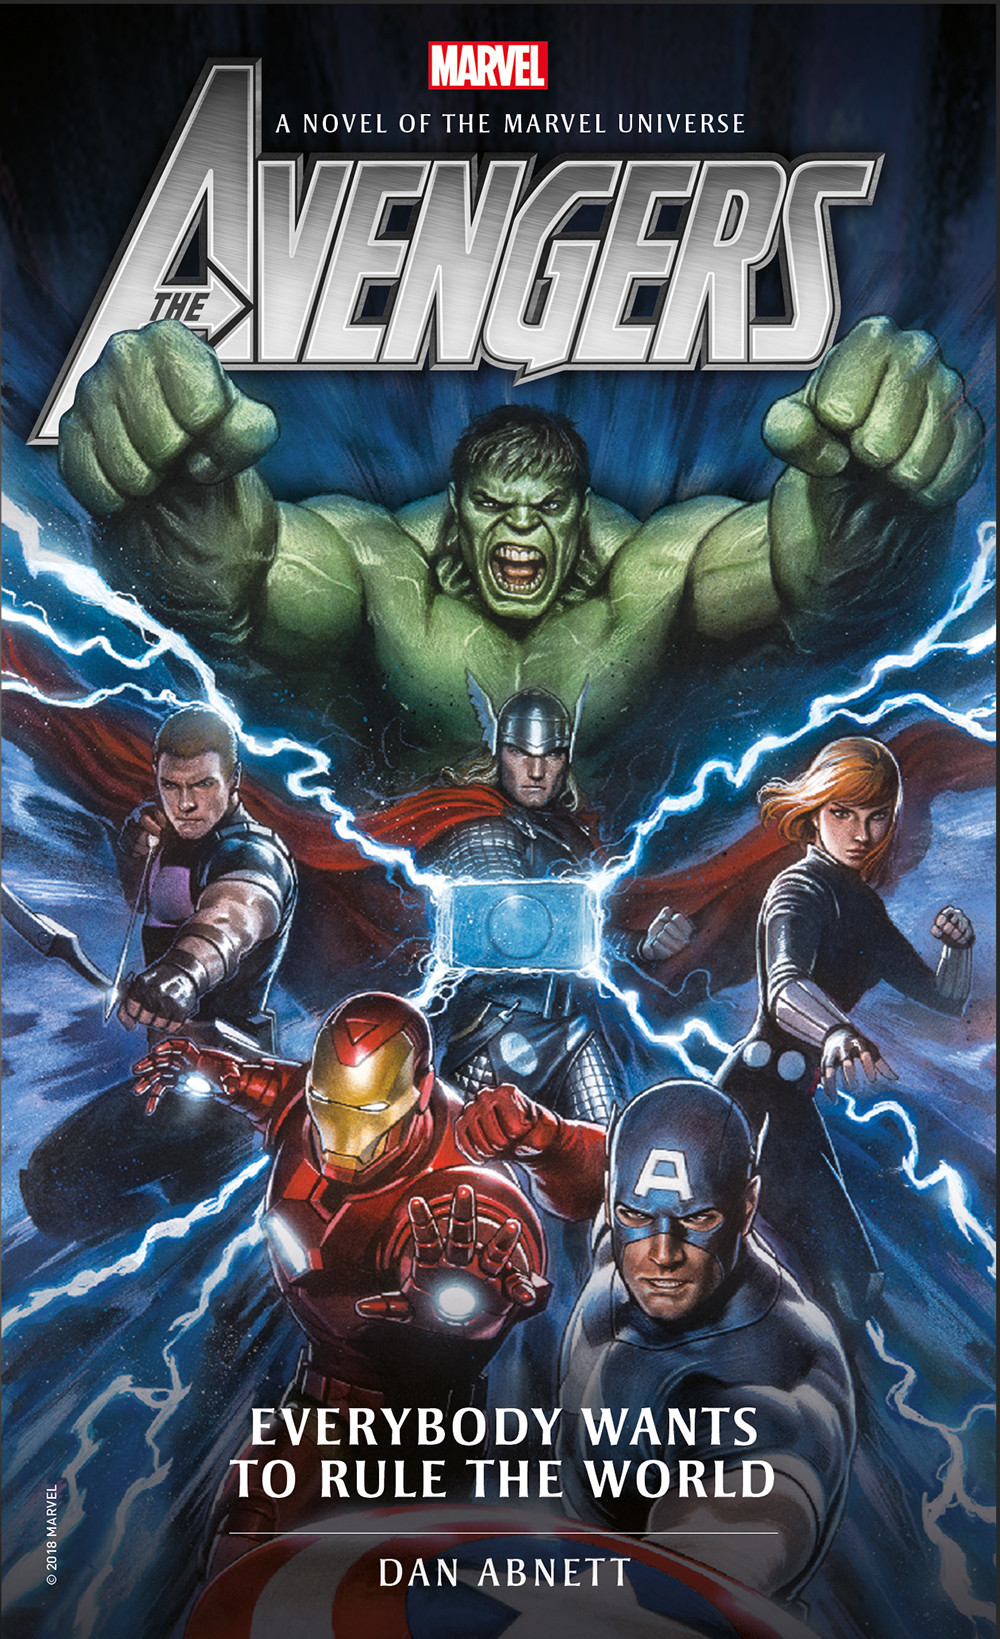 avengers_everybody_wants_to_rule_the_world.jpg